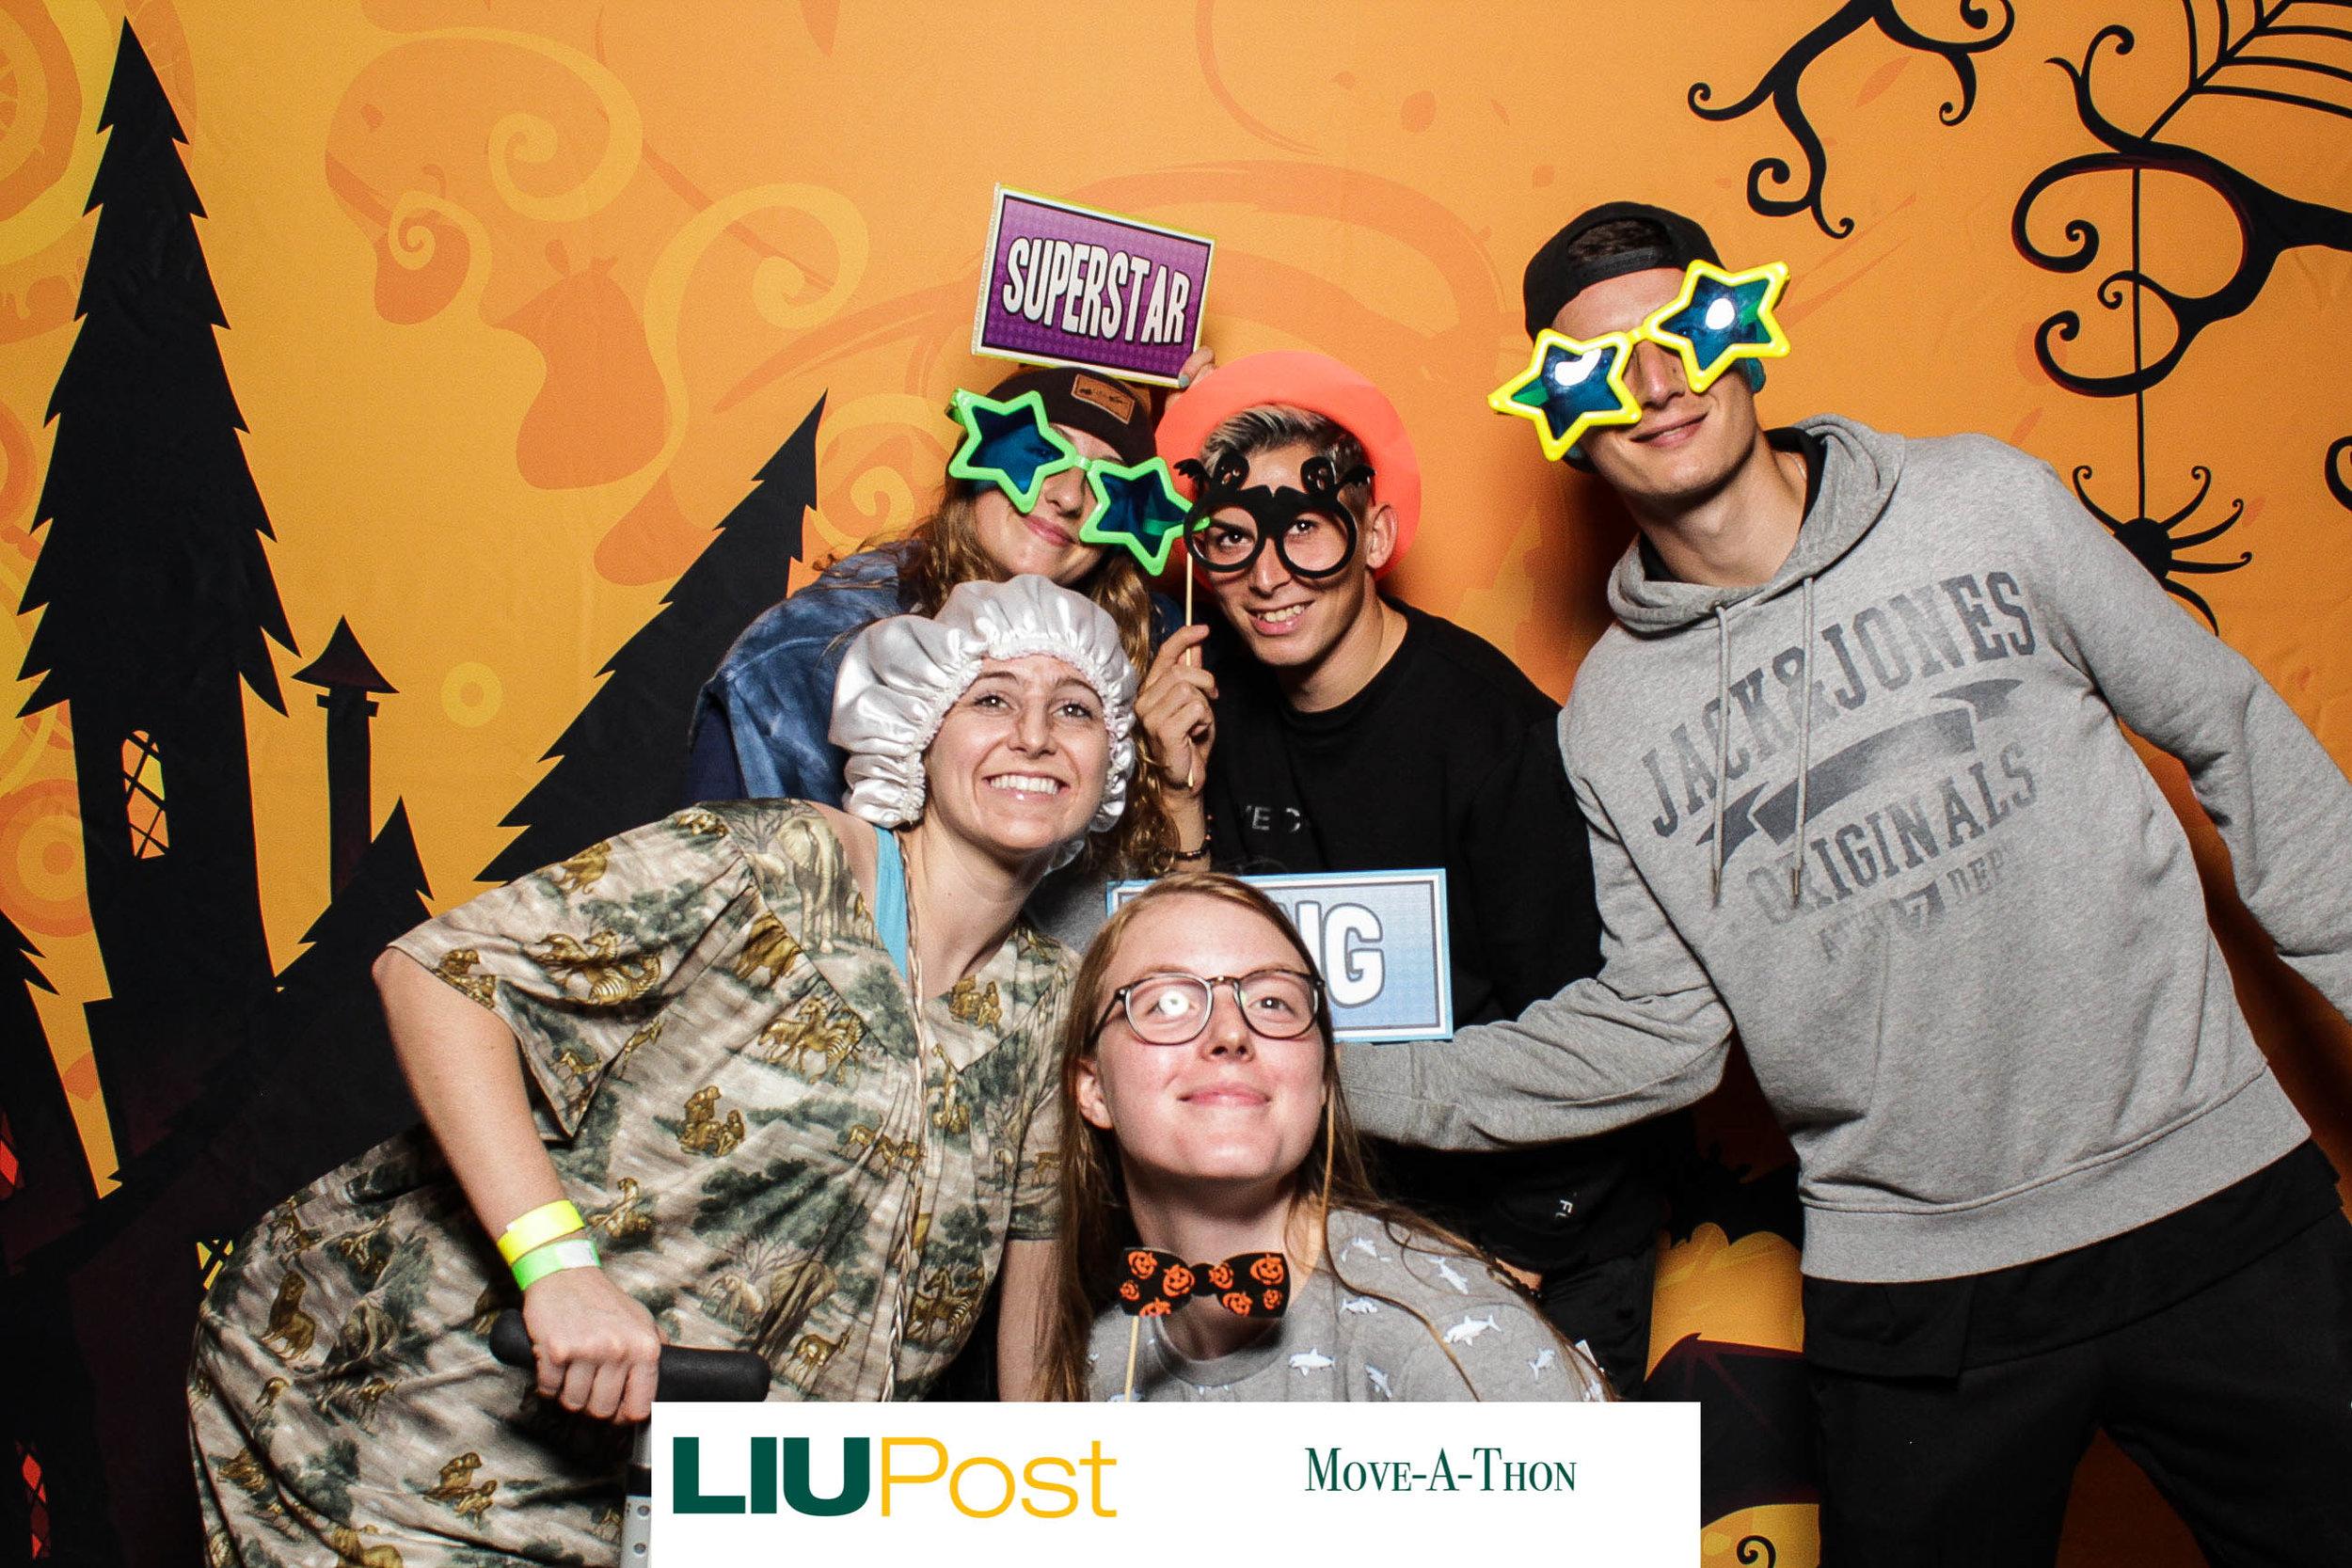 20181101_LIUPost-215.jpg